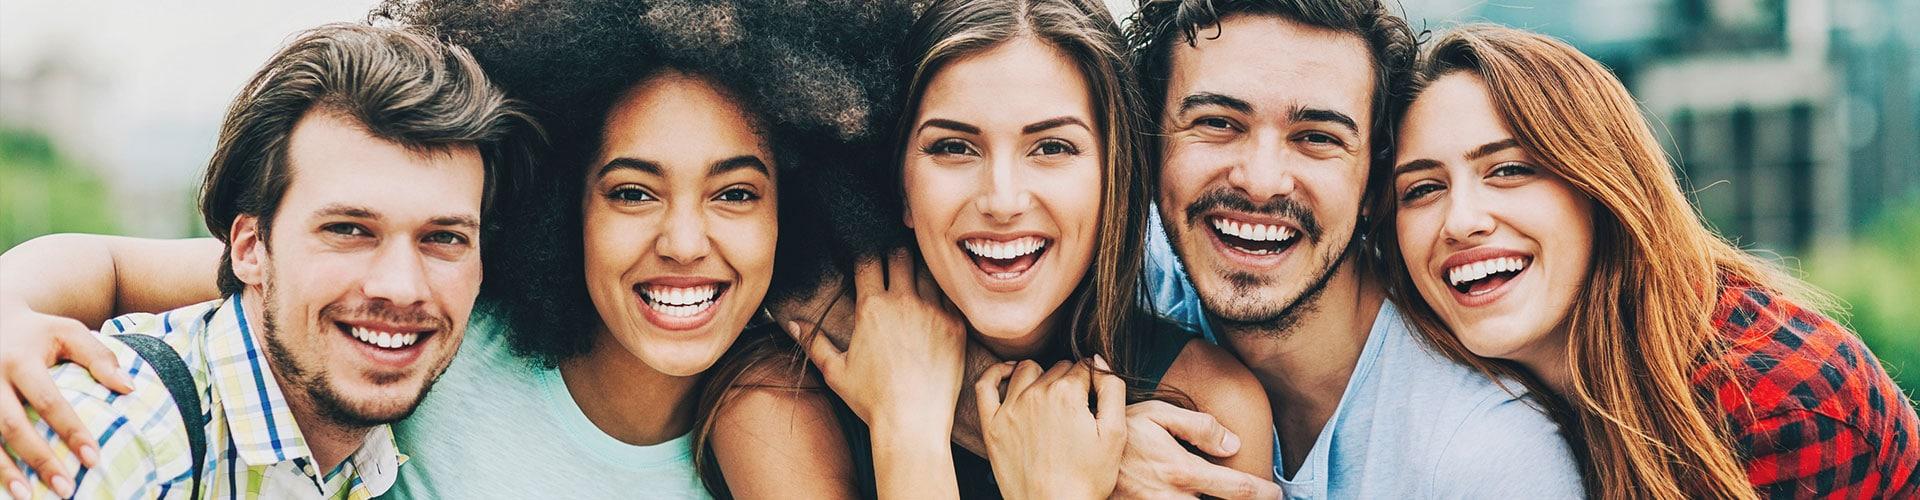 Adult Group Smile Greater Buffalo Orthodontics Buffalo NY